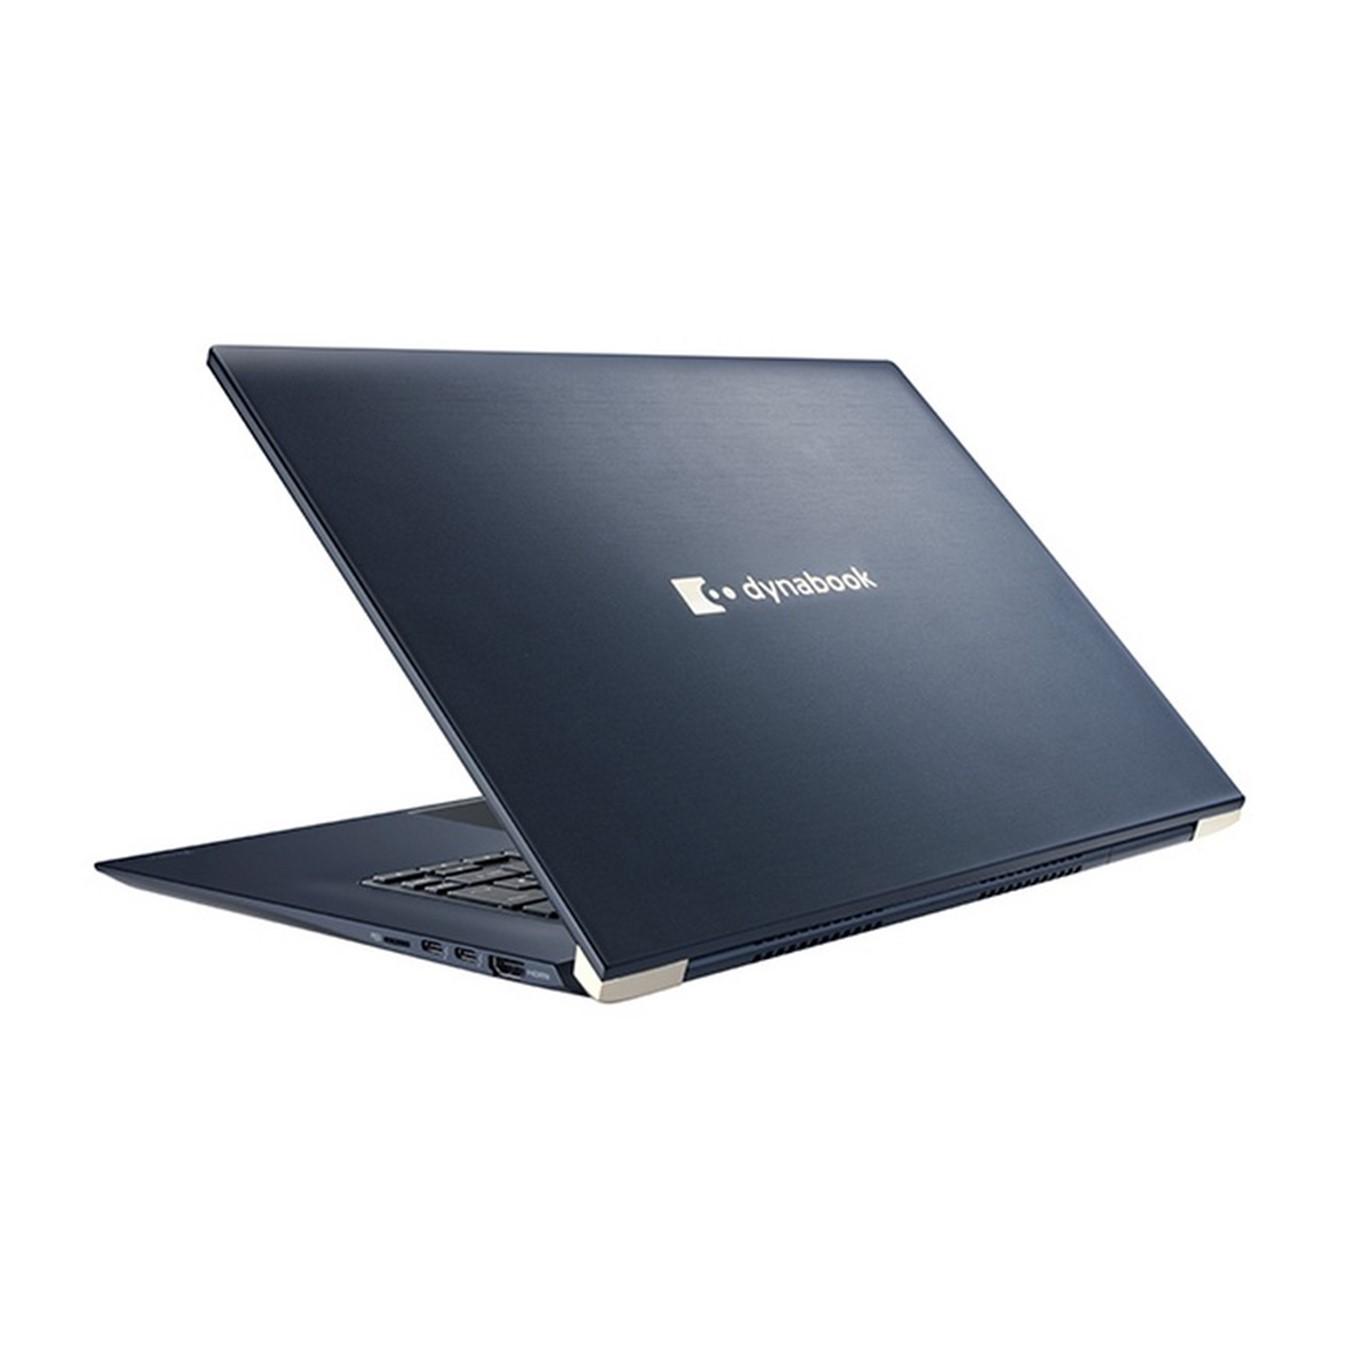 Portatil dynabook tecra x50 - f - 14r i5 - 8265u 15.6pulgadas 8gb - ssd512gb - wifi - bt - w10pro